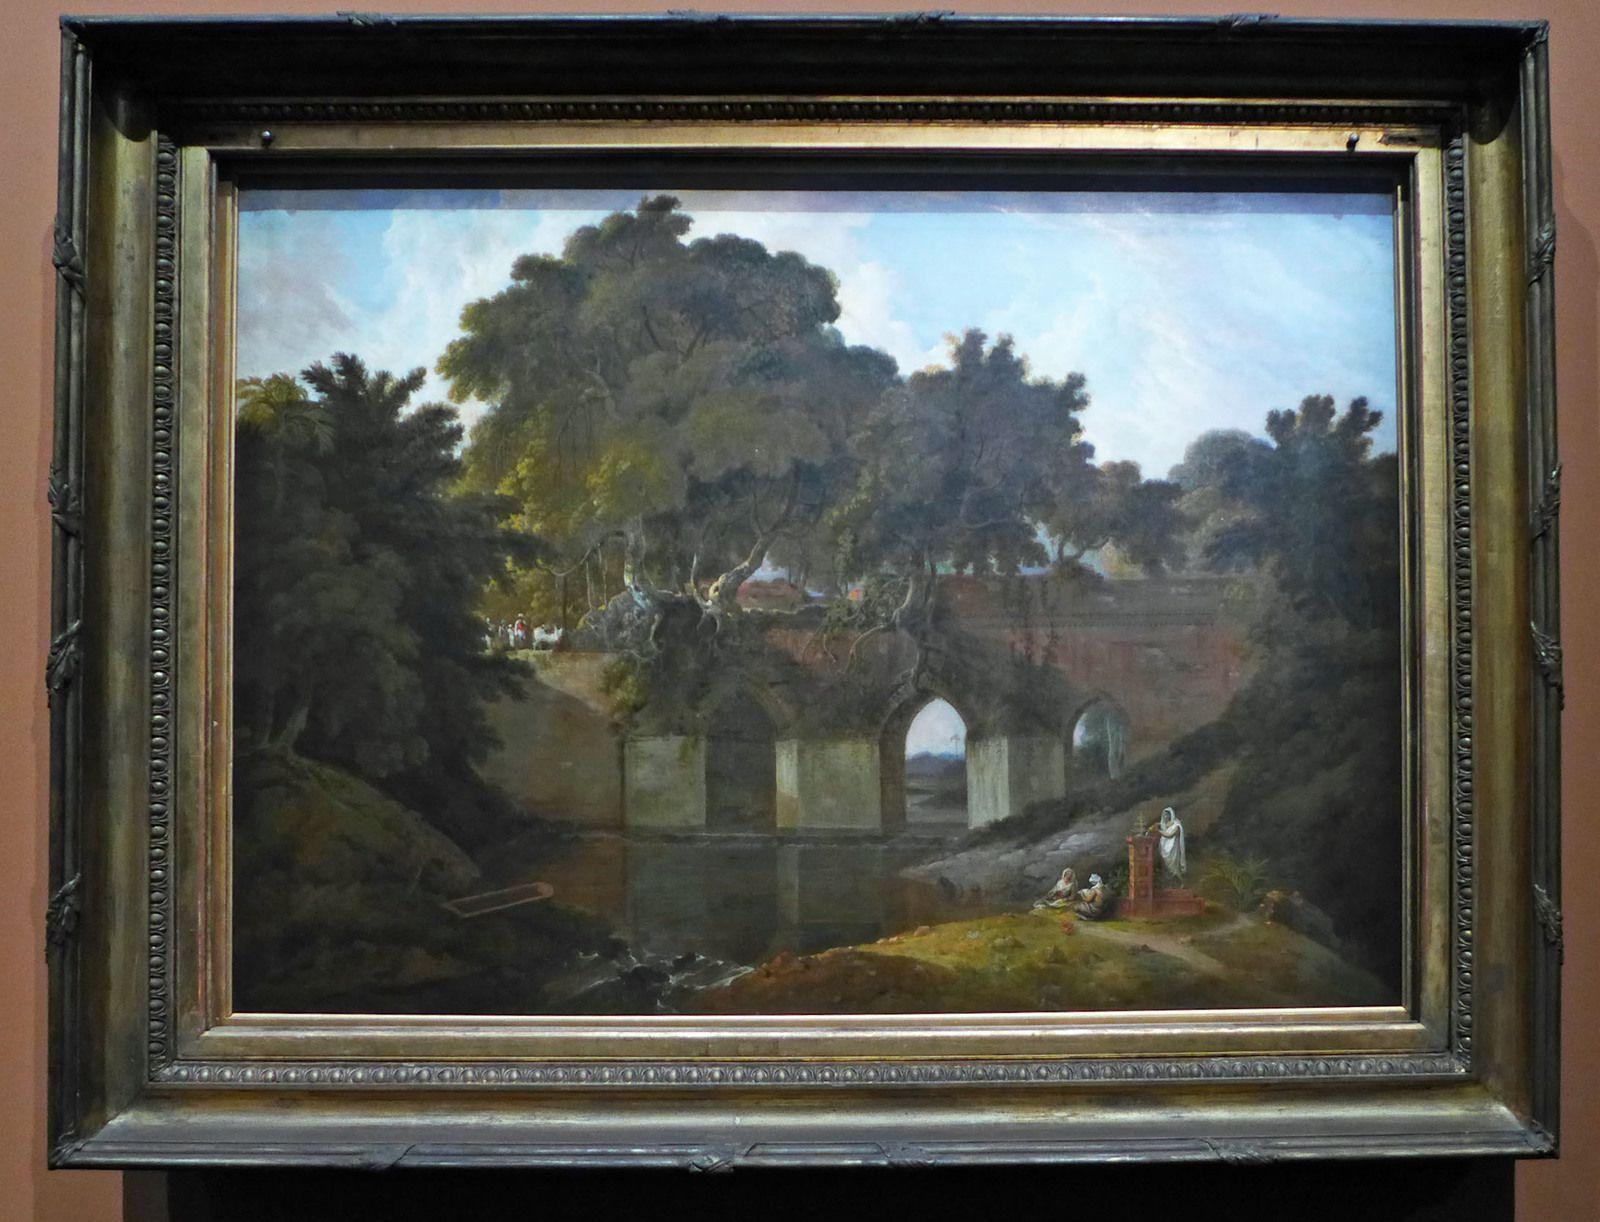 Thomas Daniell, Idgah au Amroha (1810) - Pont près de Rajmahal dans le Bihar (1827)